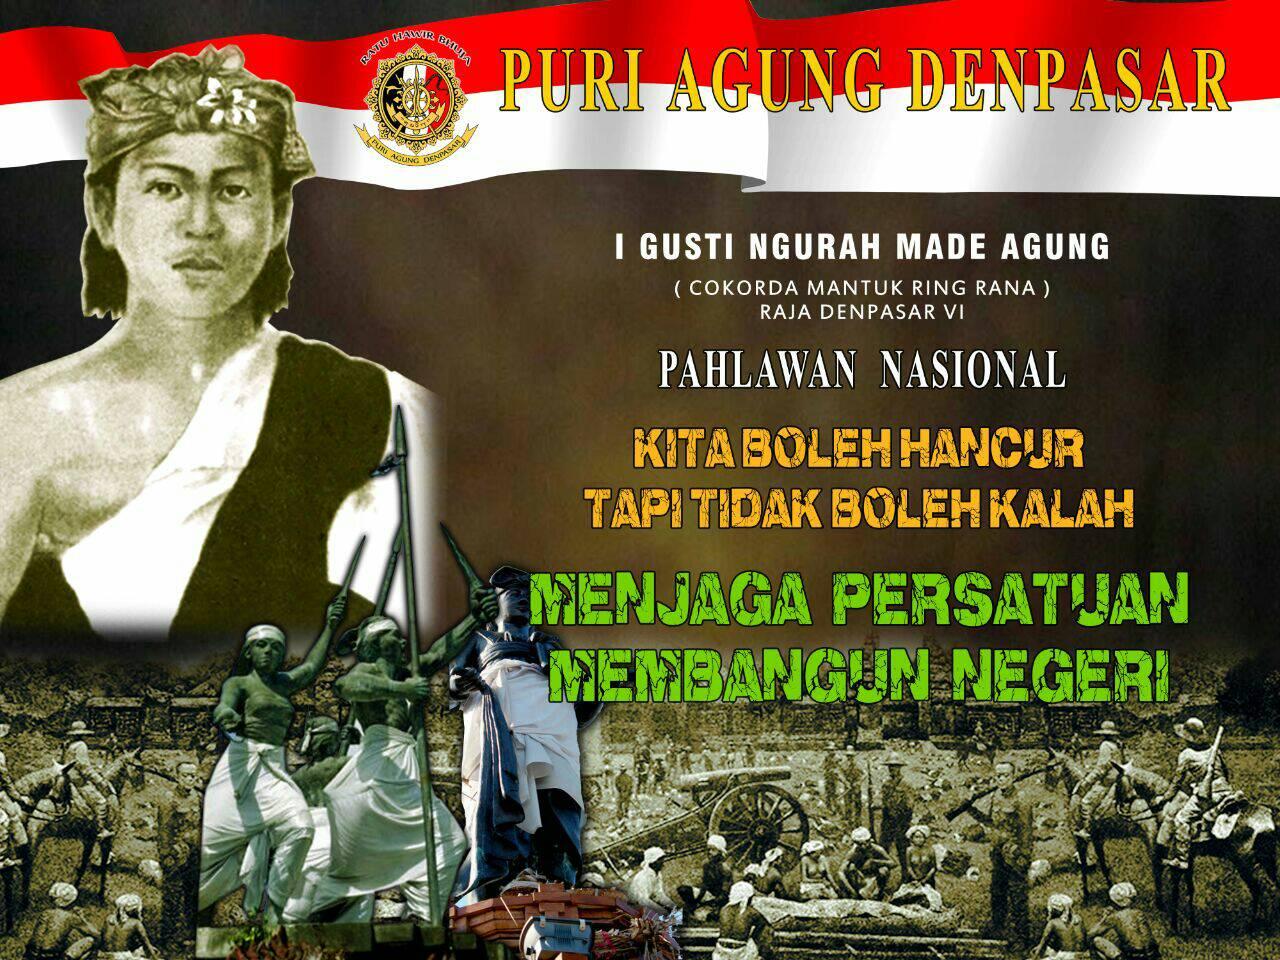 banner puri agung denpasar